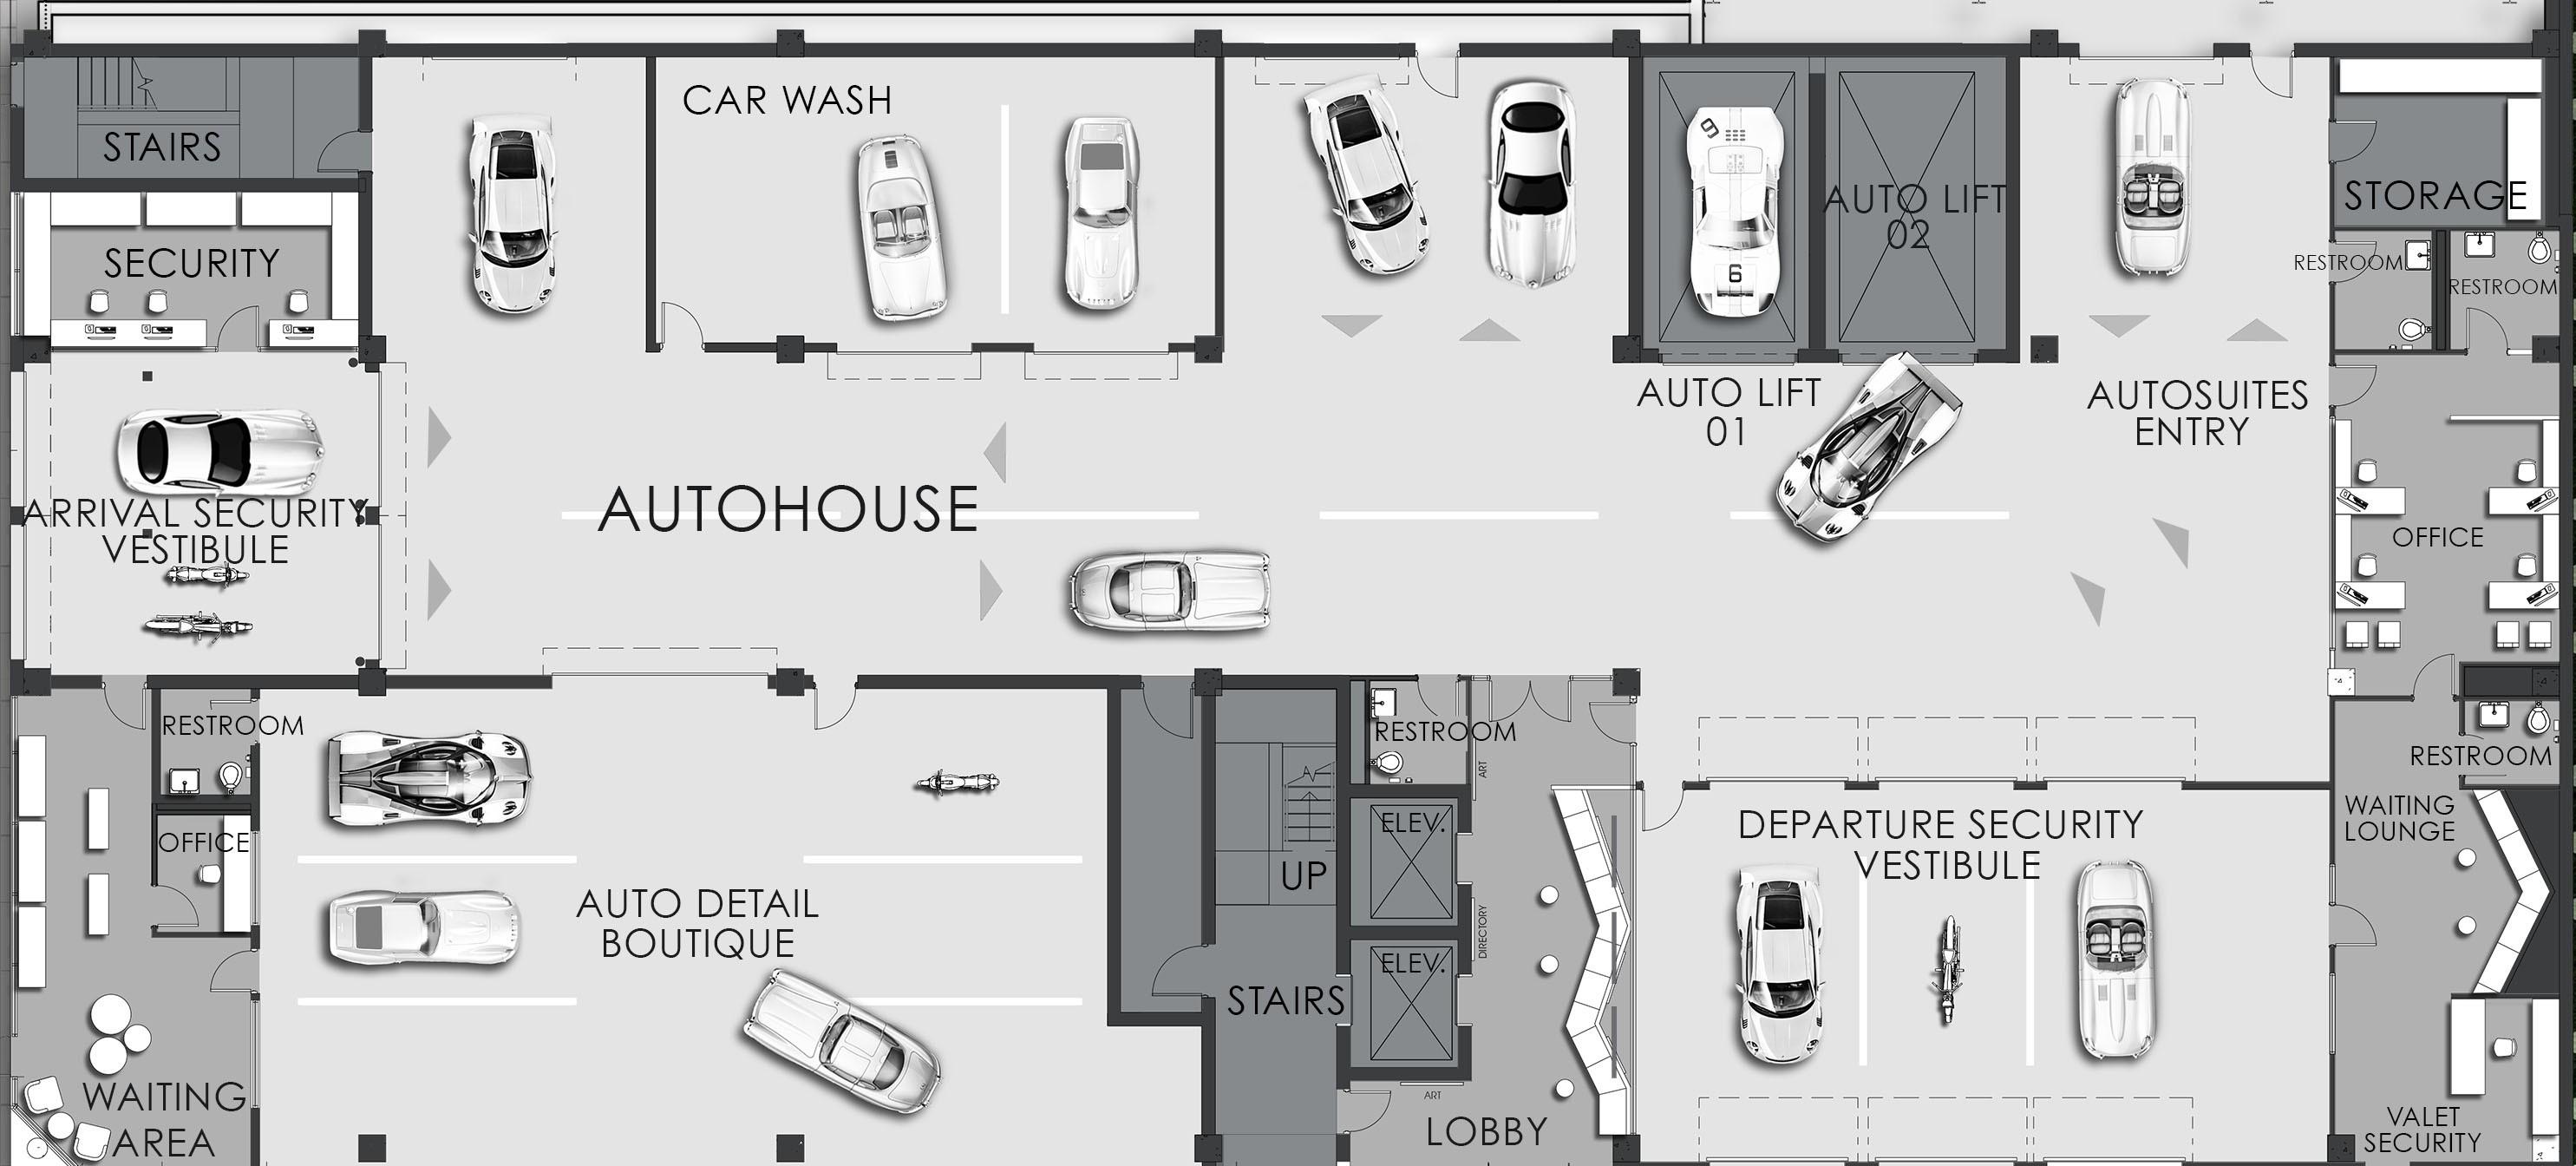 Car Coordinates Document Floor Plan Audit